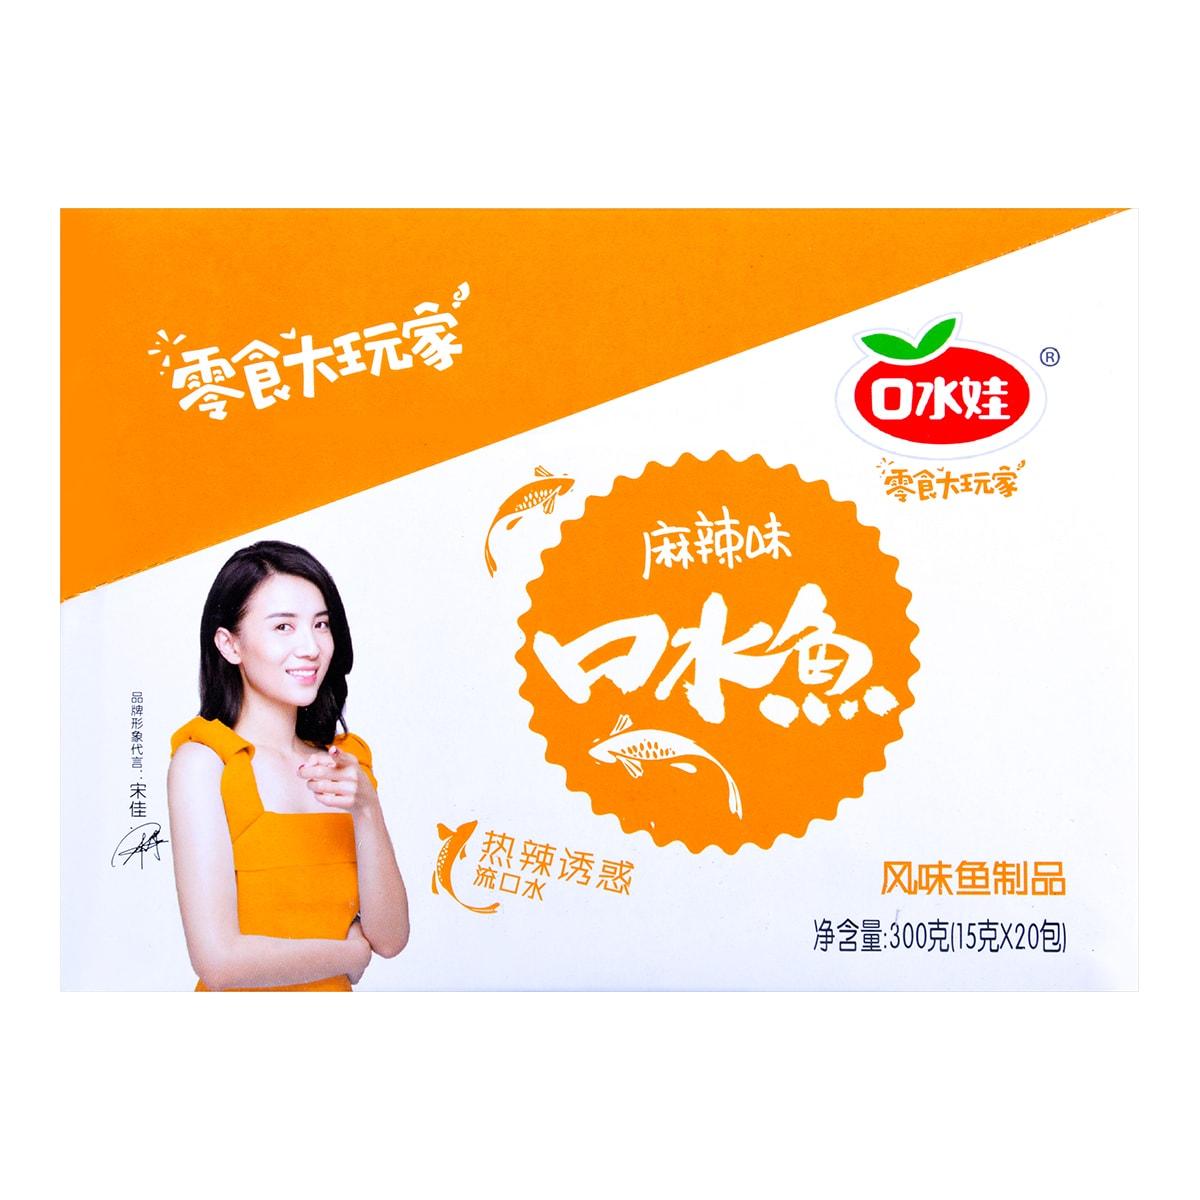 KOUSHUIWA Koushuiyu Hot  Spicy Flavor 20 packs into 260g